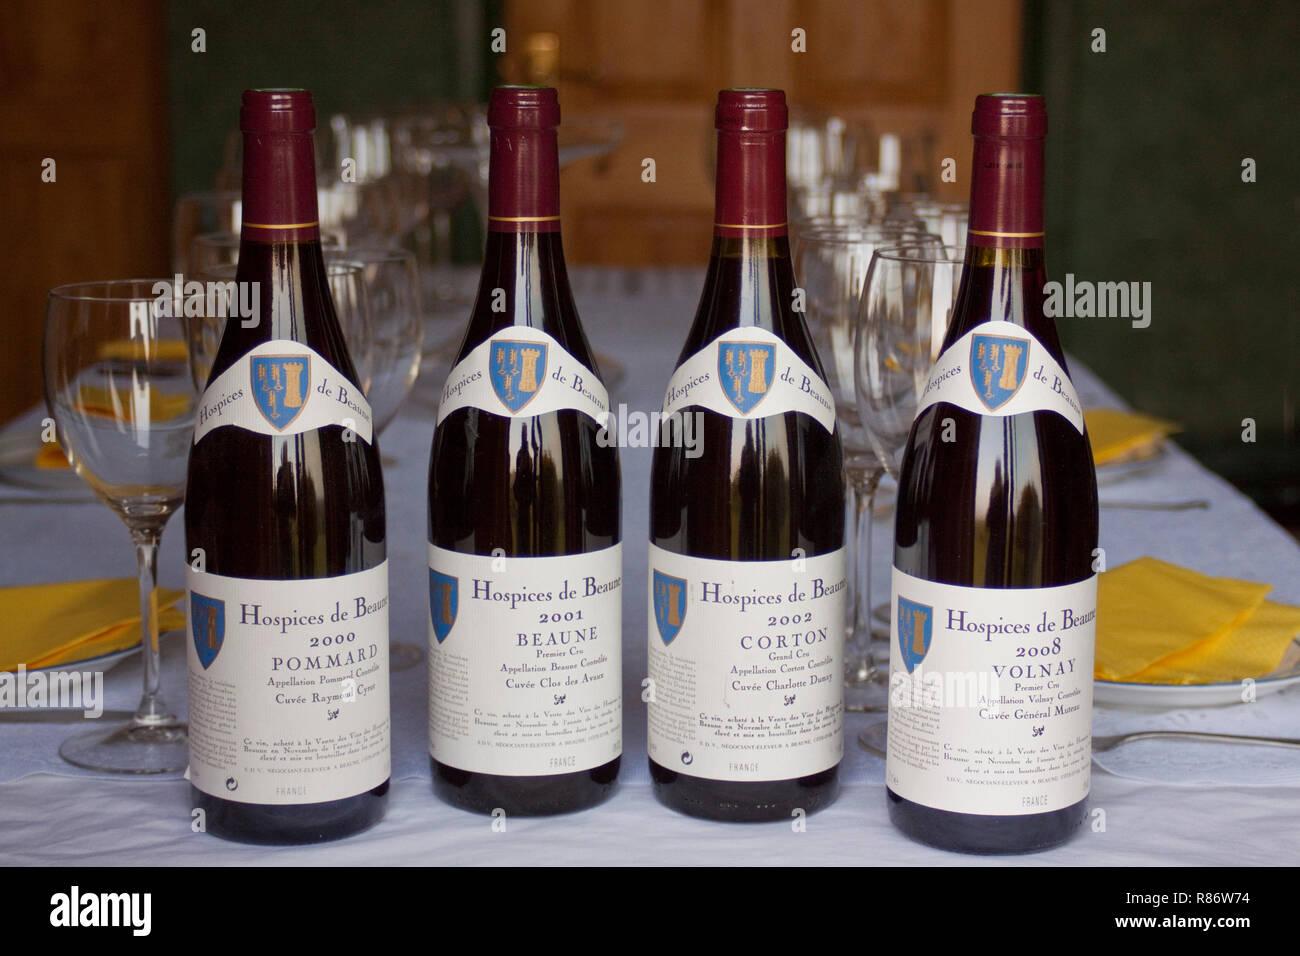 Hospices de Beaune bottle Burgundy wine - Stock Image